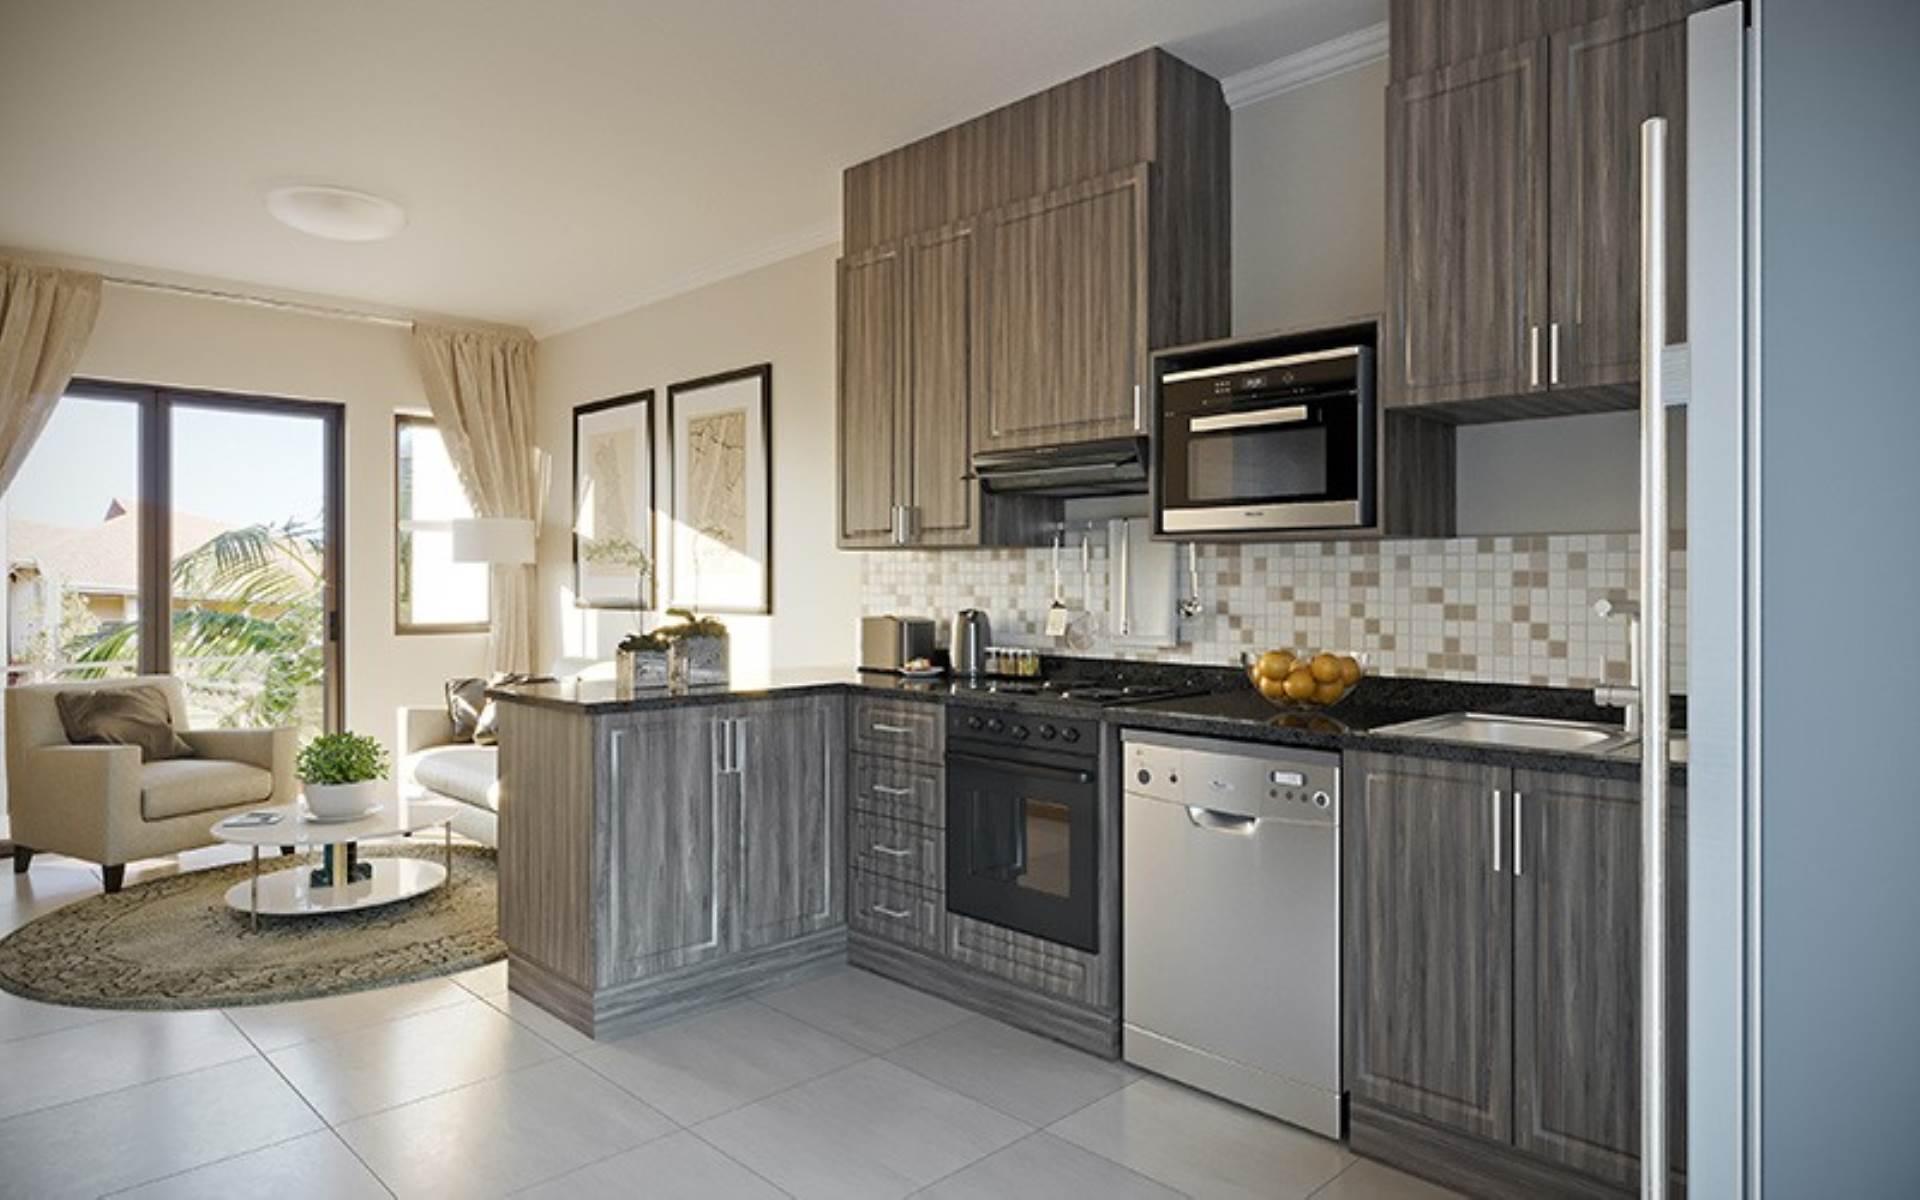 Retirement Village For Sale In Hazeldean, Pretoria, Gauteng for R